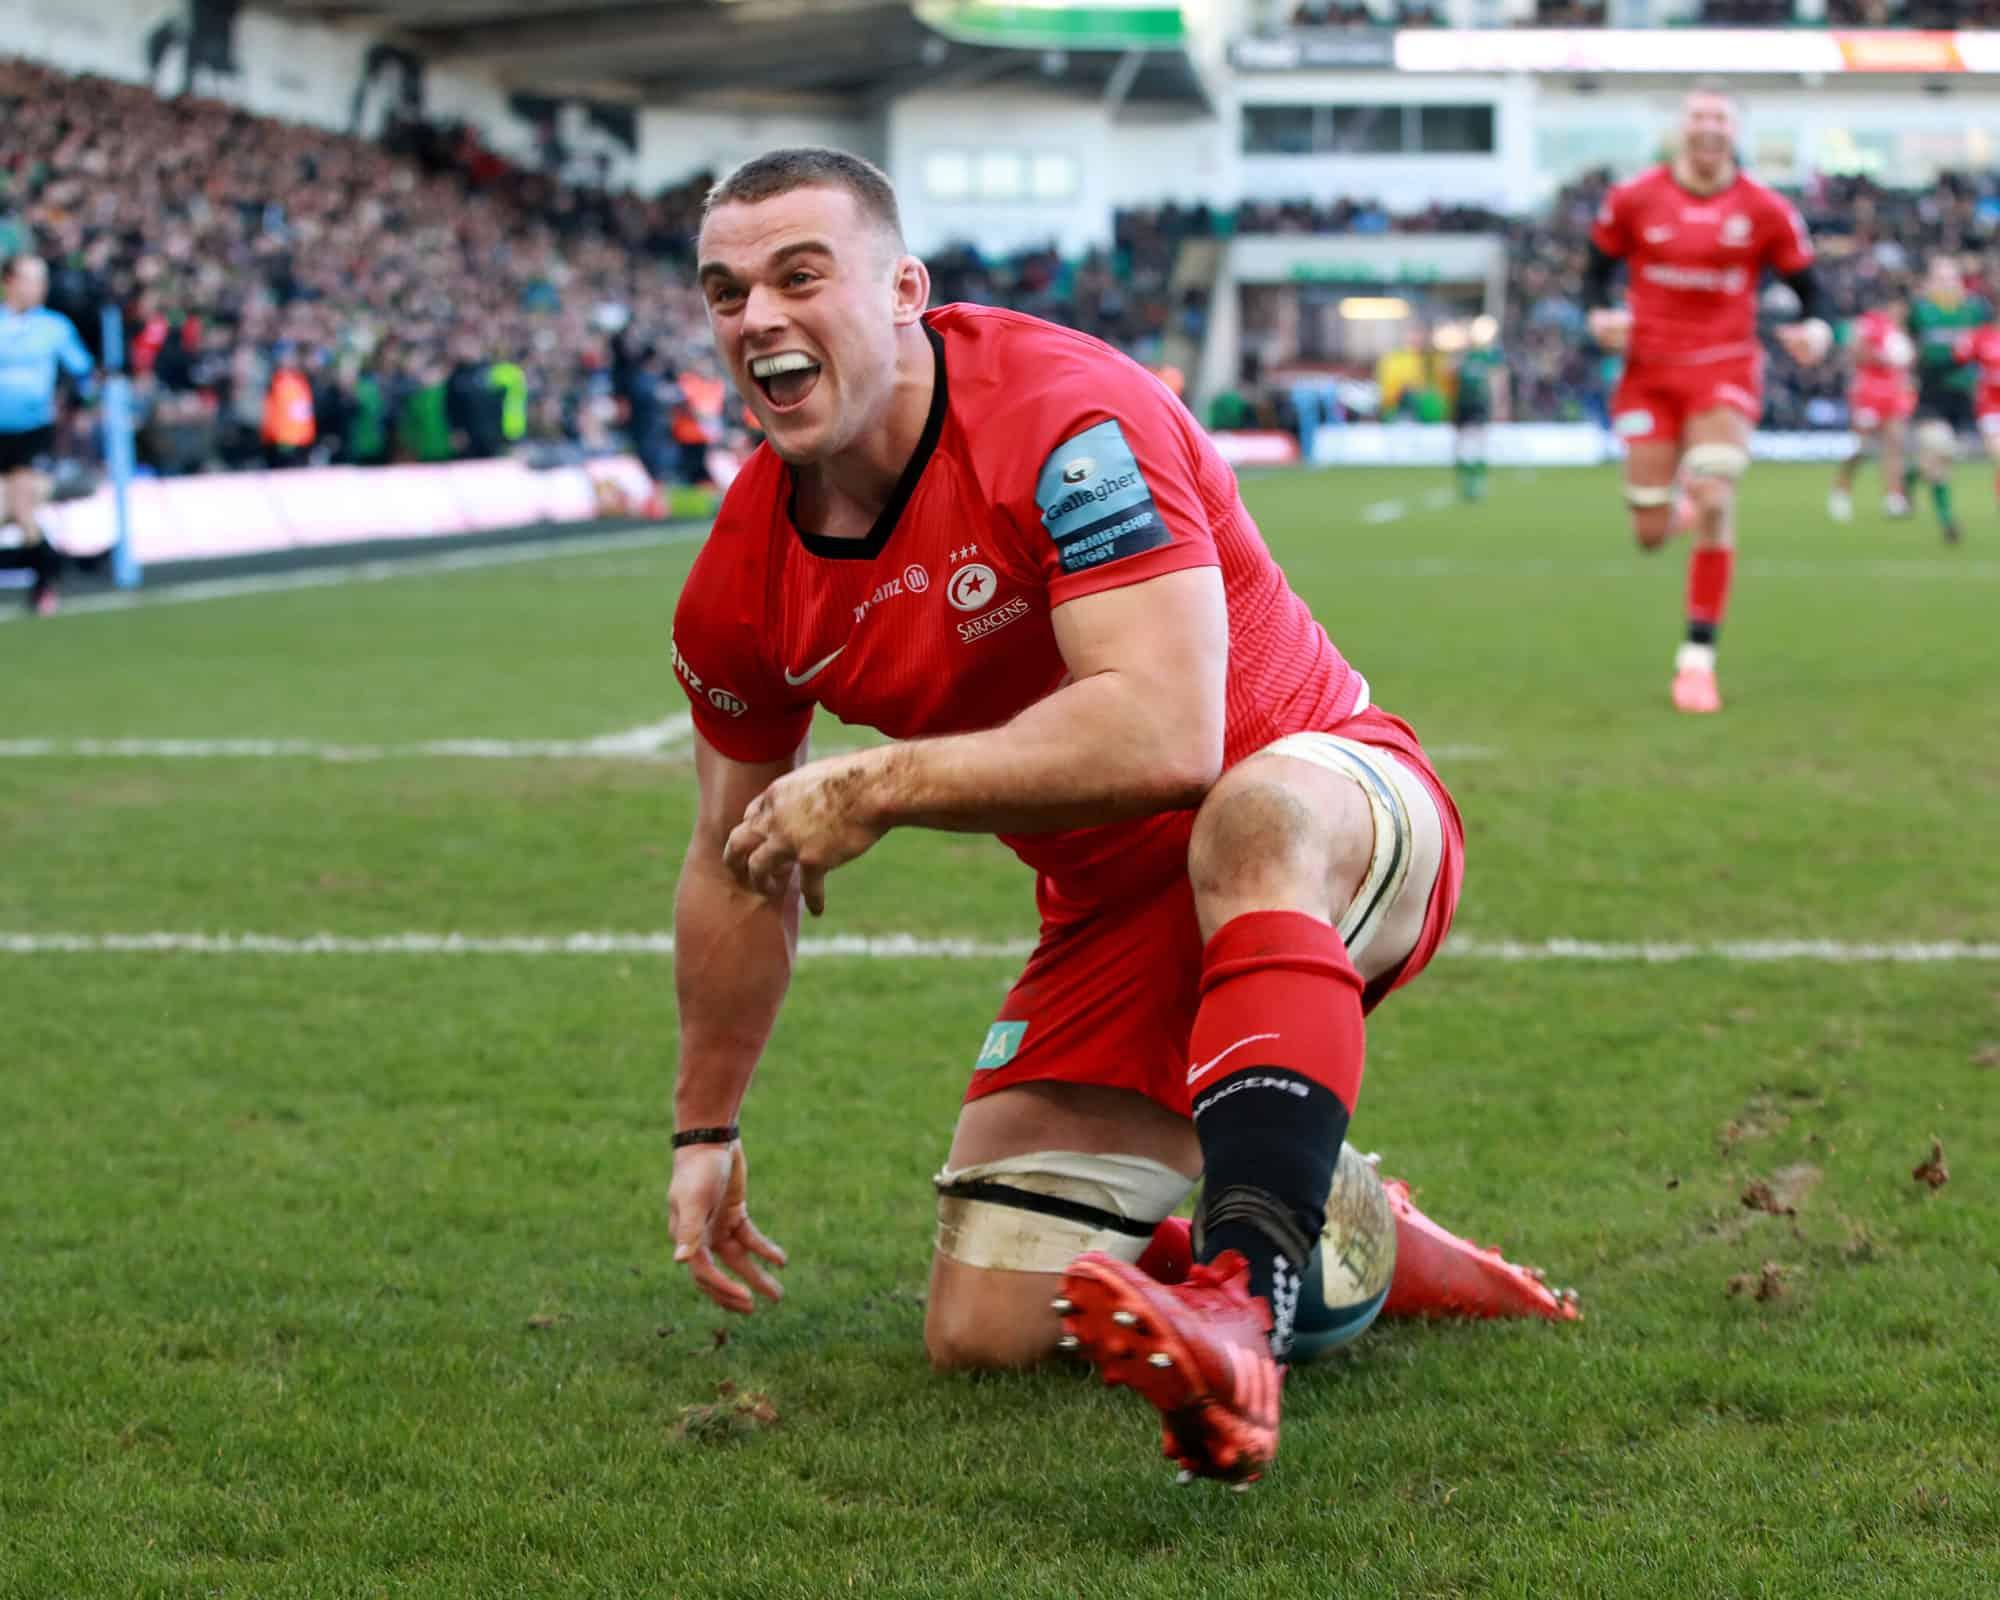 Northampton Saints v Saracens - Gallagher Premiership Rugby